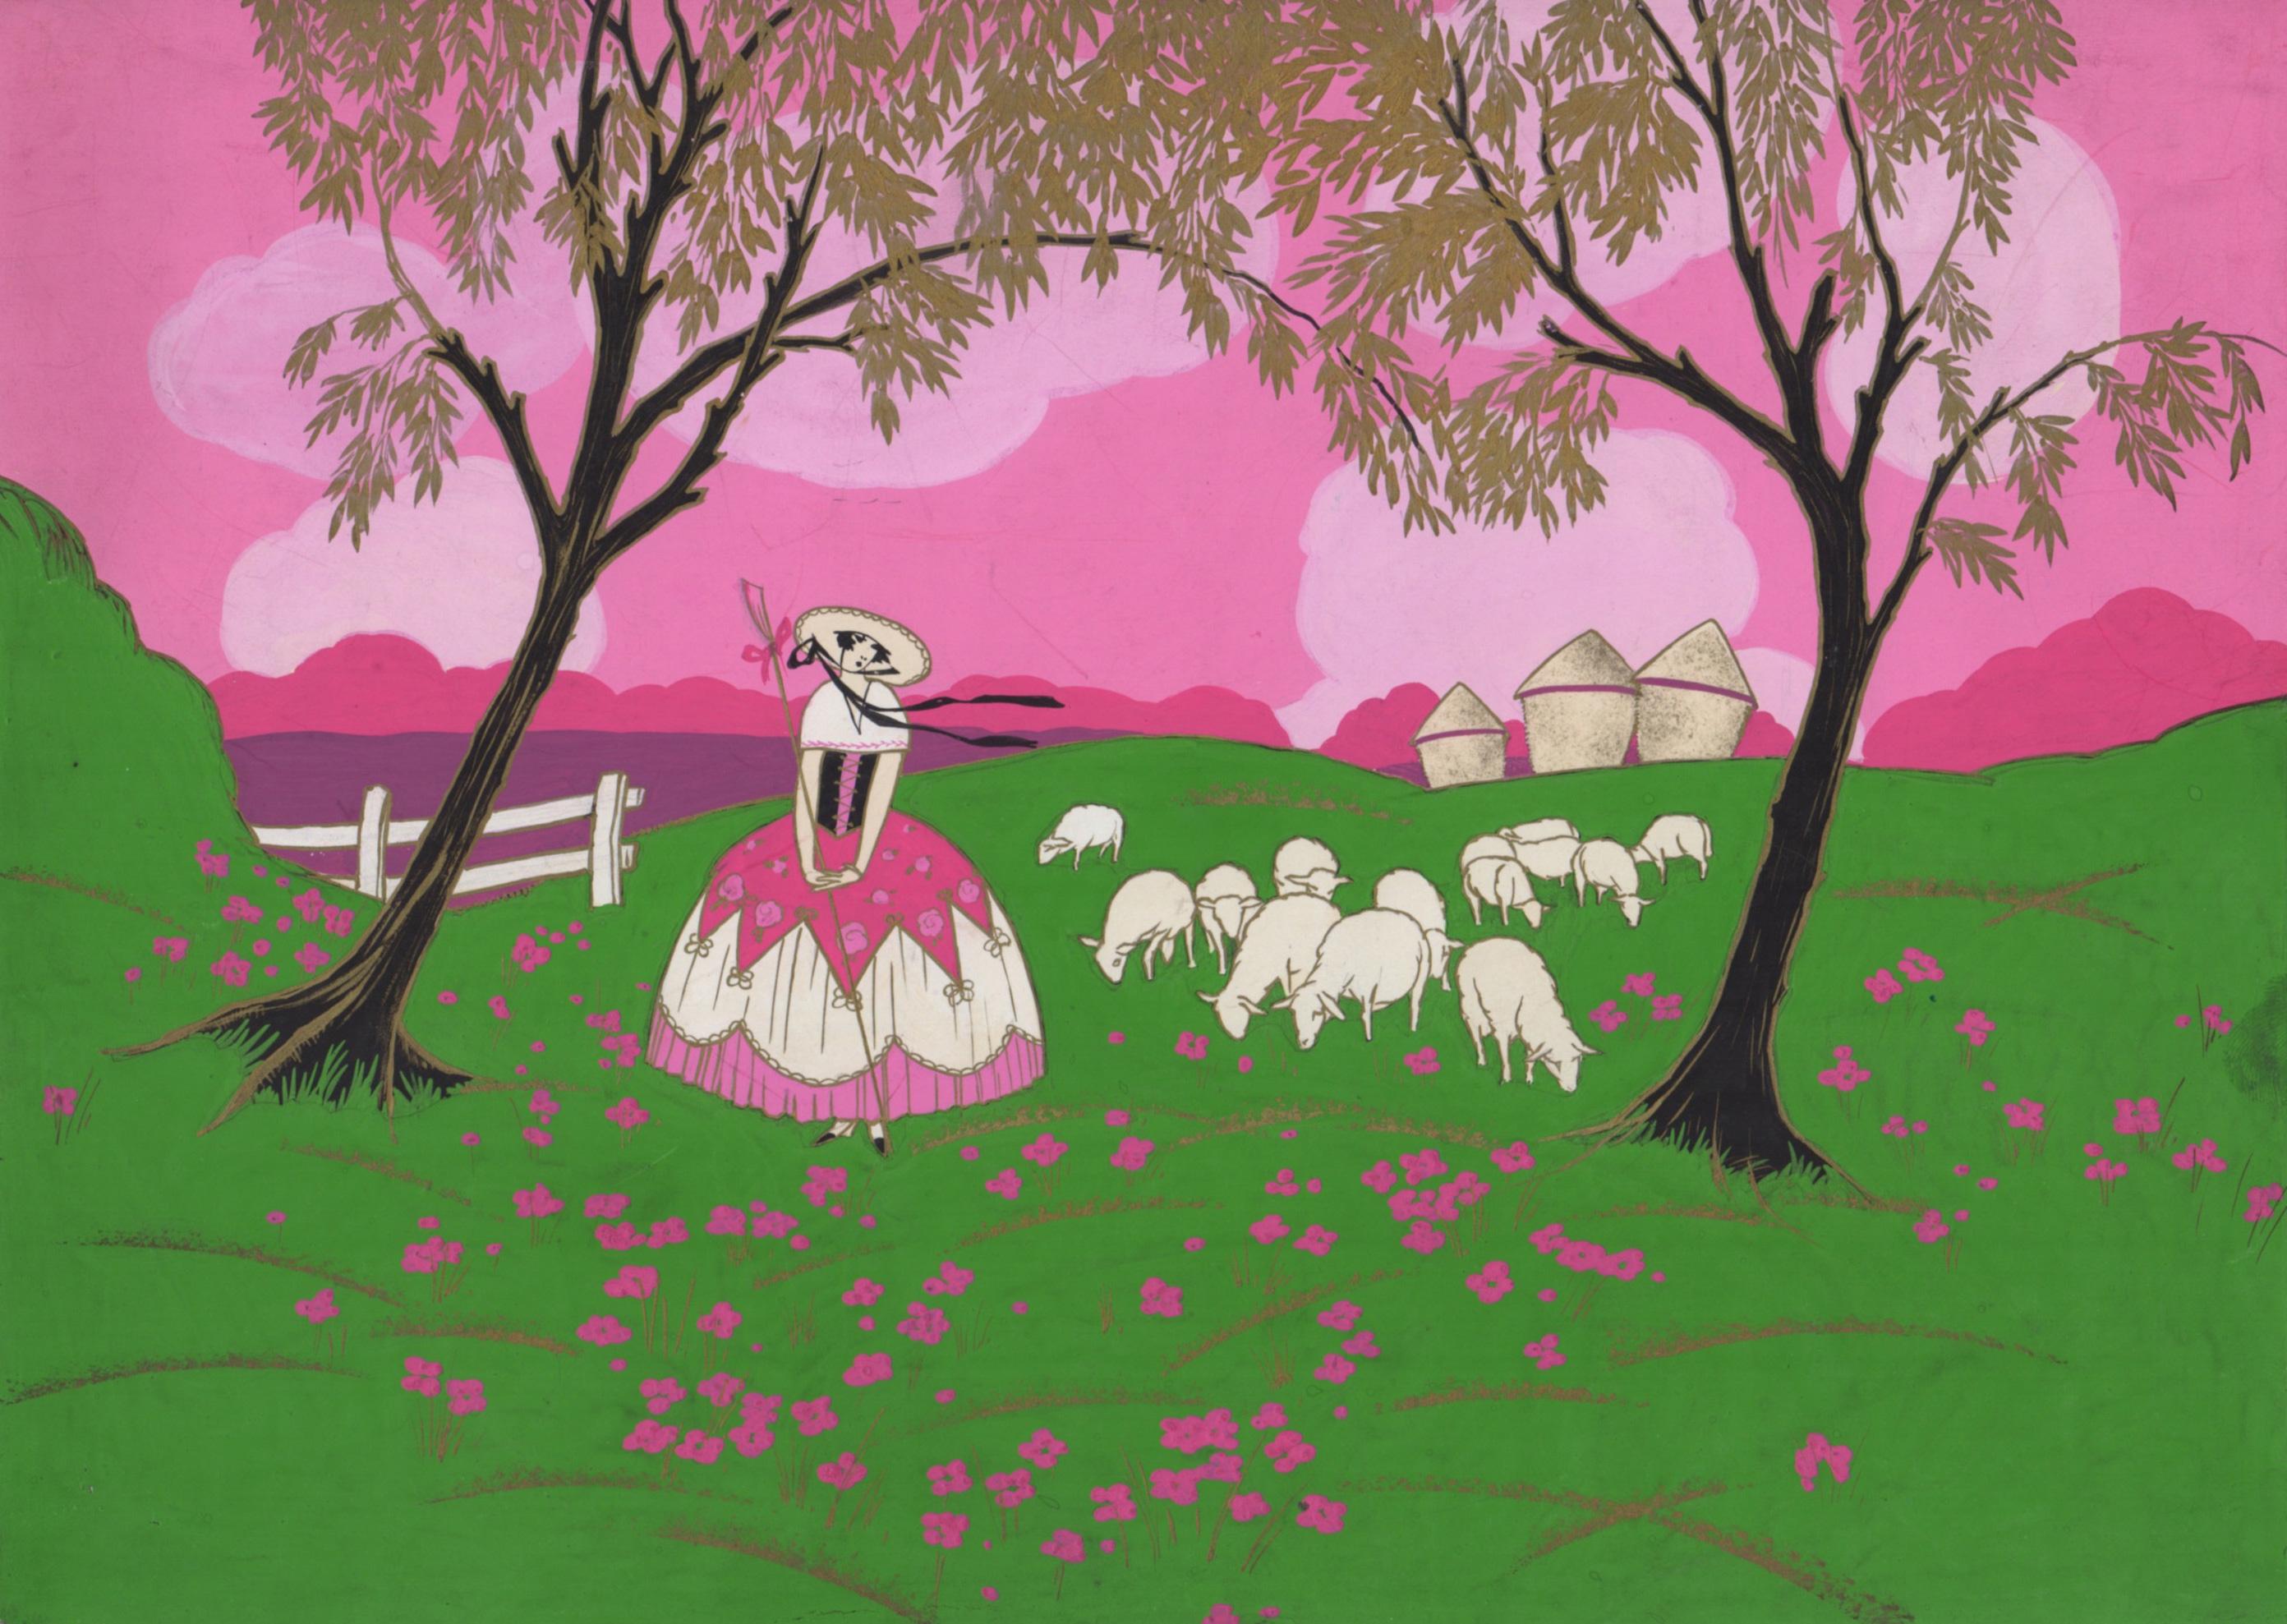 La bergère | La bergère | artiste inconnu